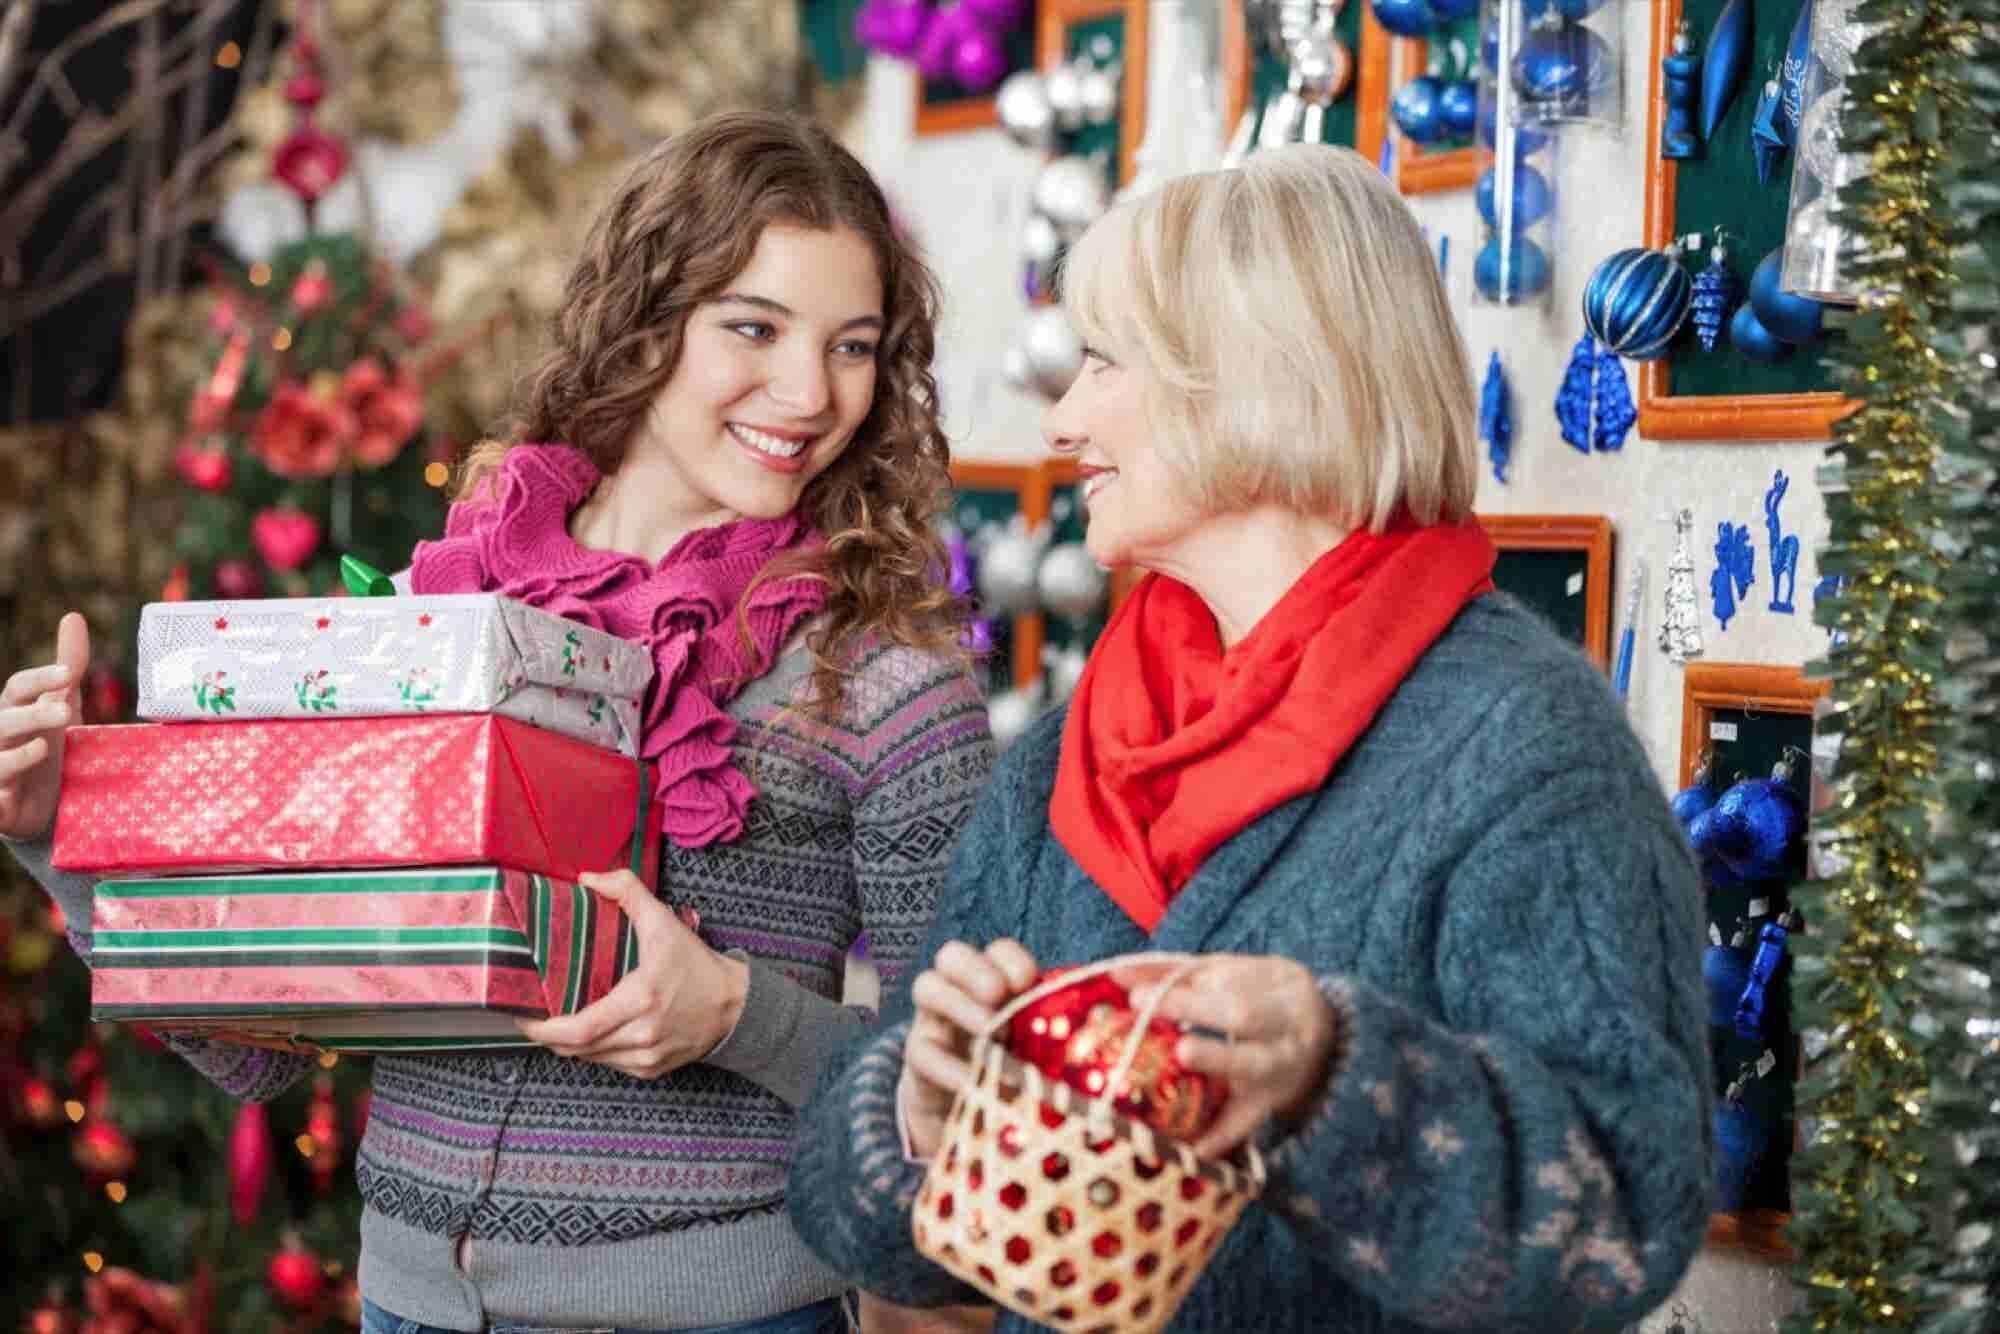 Claves para hacer marketing navideño